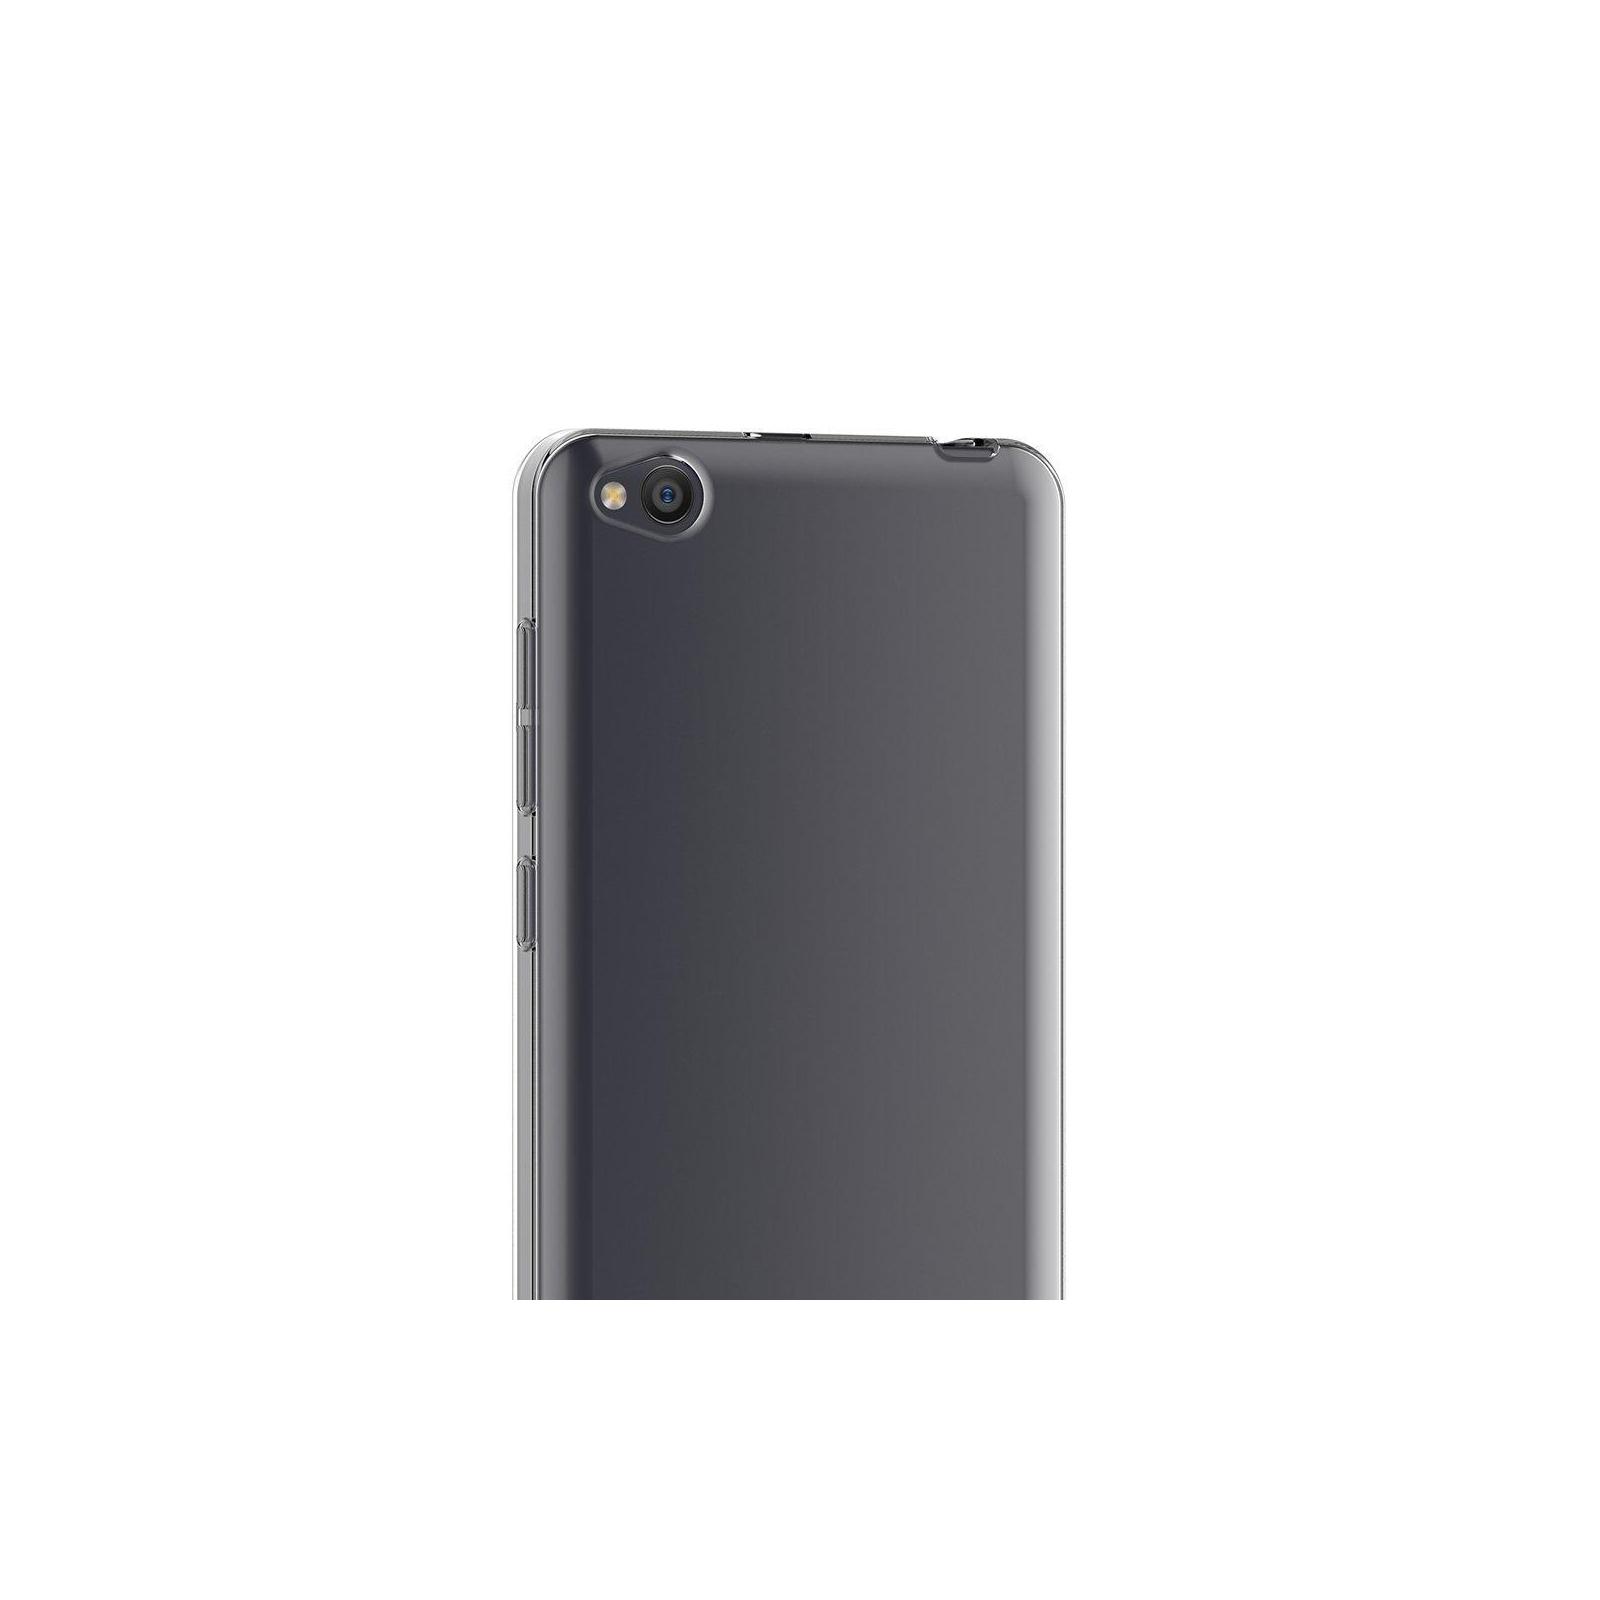 Чехол для моб. телефона Laudtec для Xiaomi Redmi 5A Clear tpu (Transperent) (LC-XR5A) изображение 7